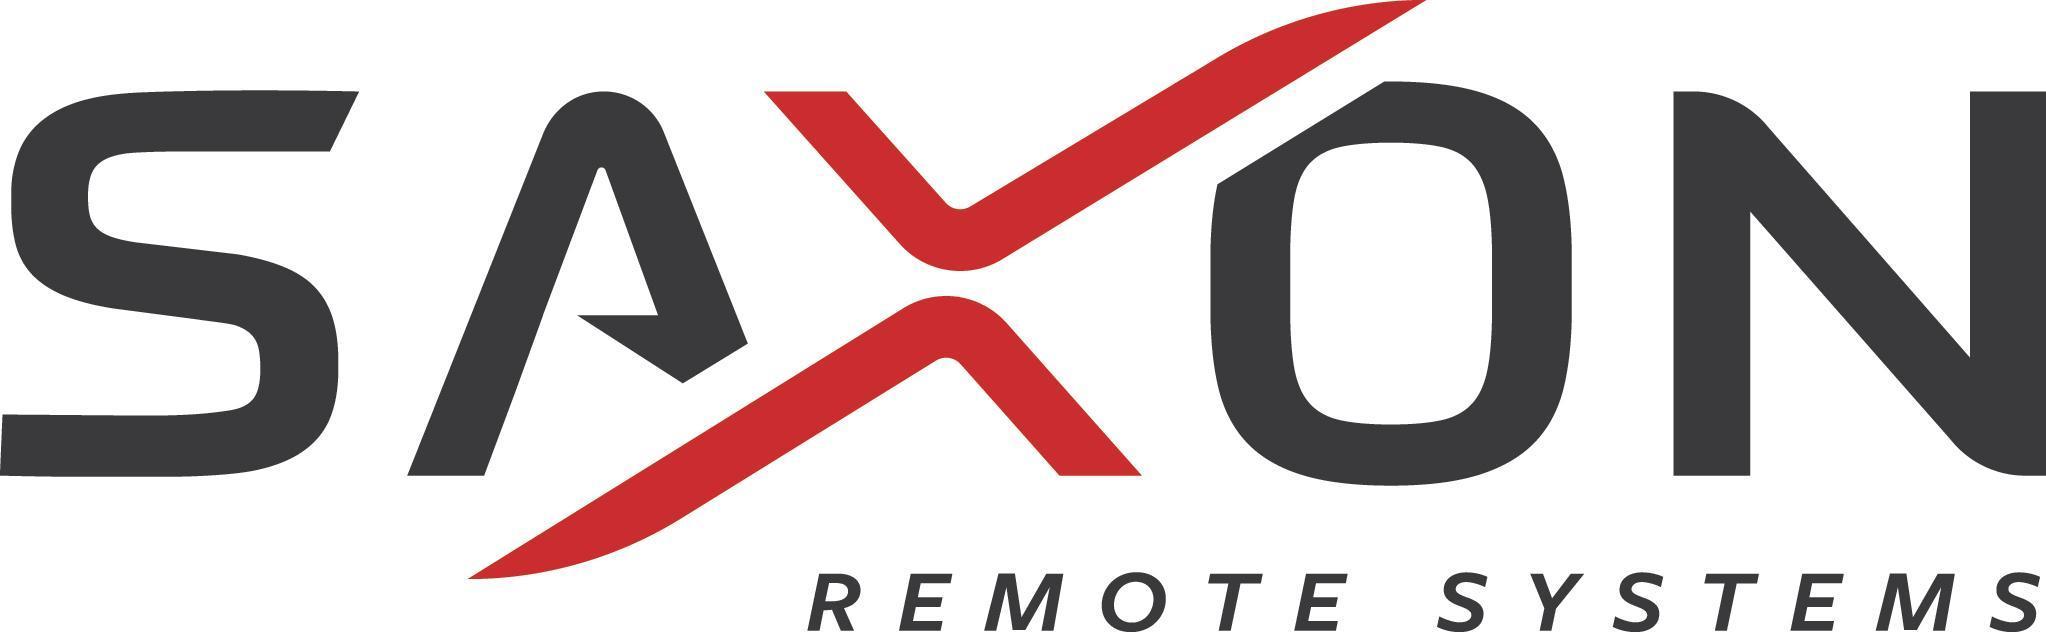 Saxon Remote Systems.jpg